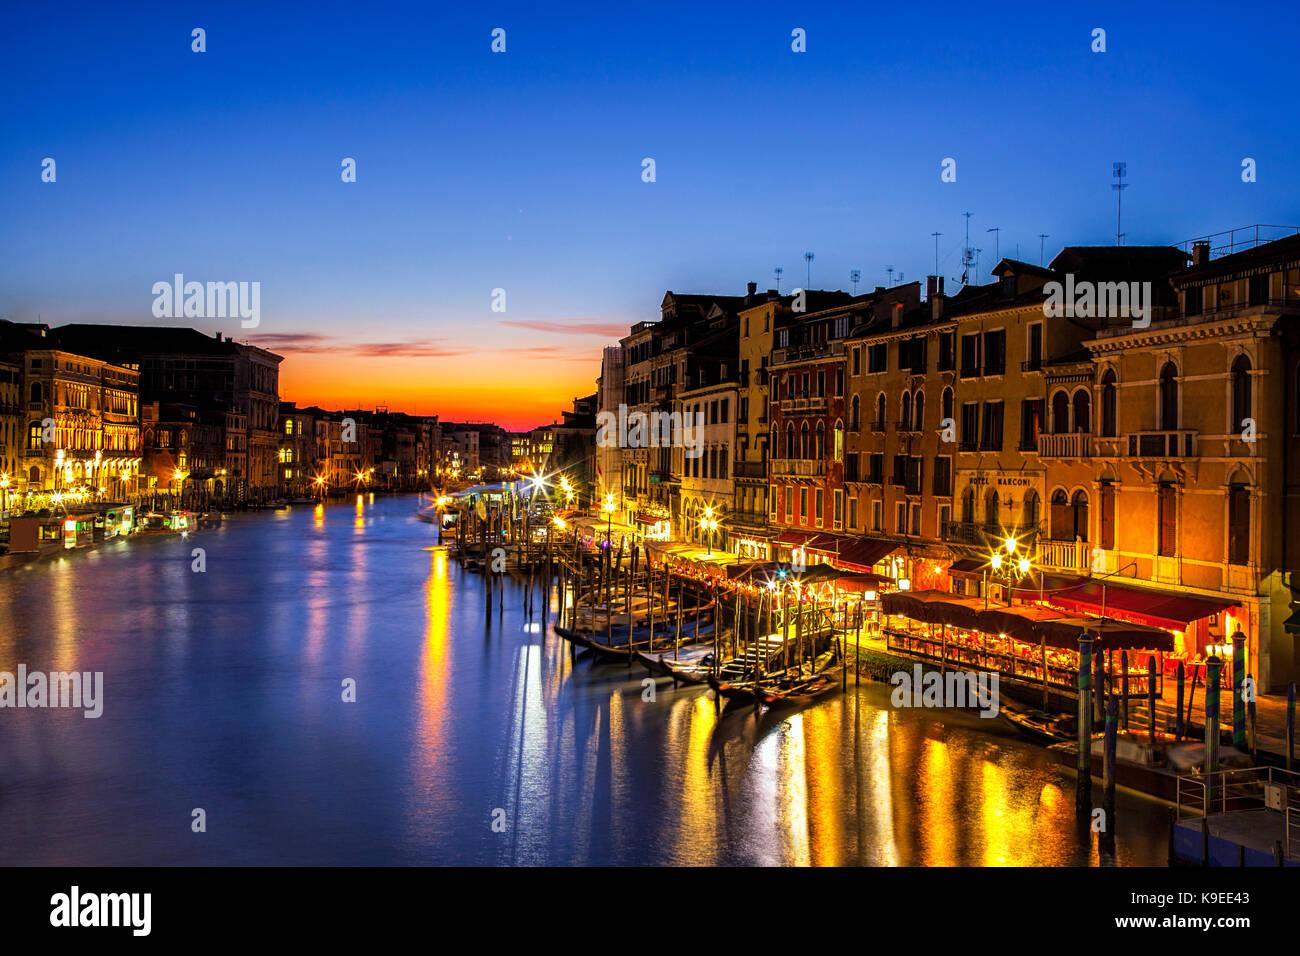 Twilight scene from the Rialto Bridge in Venice, Italy - Stock Image